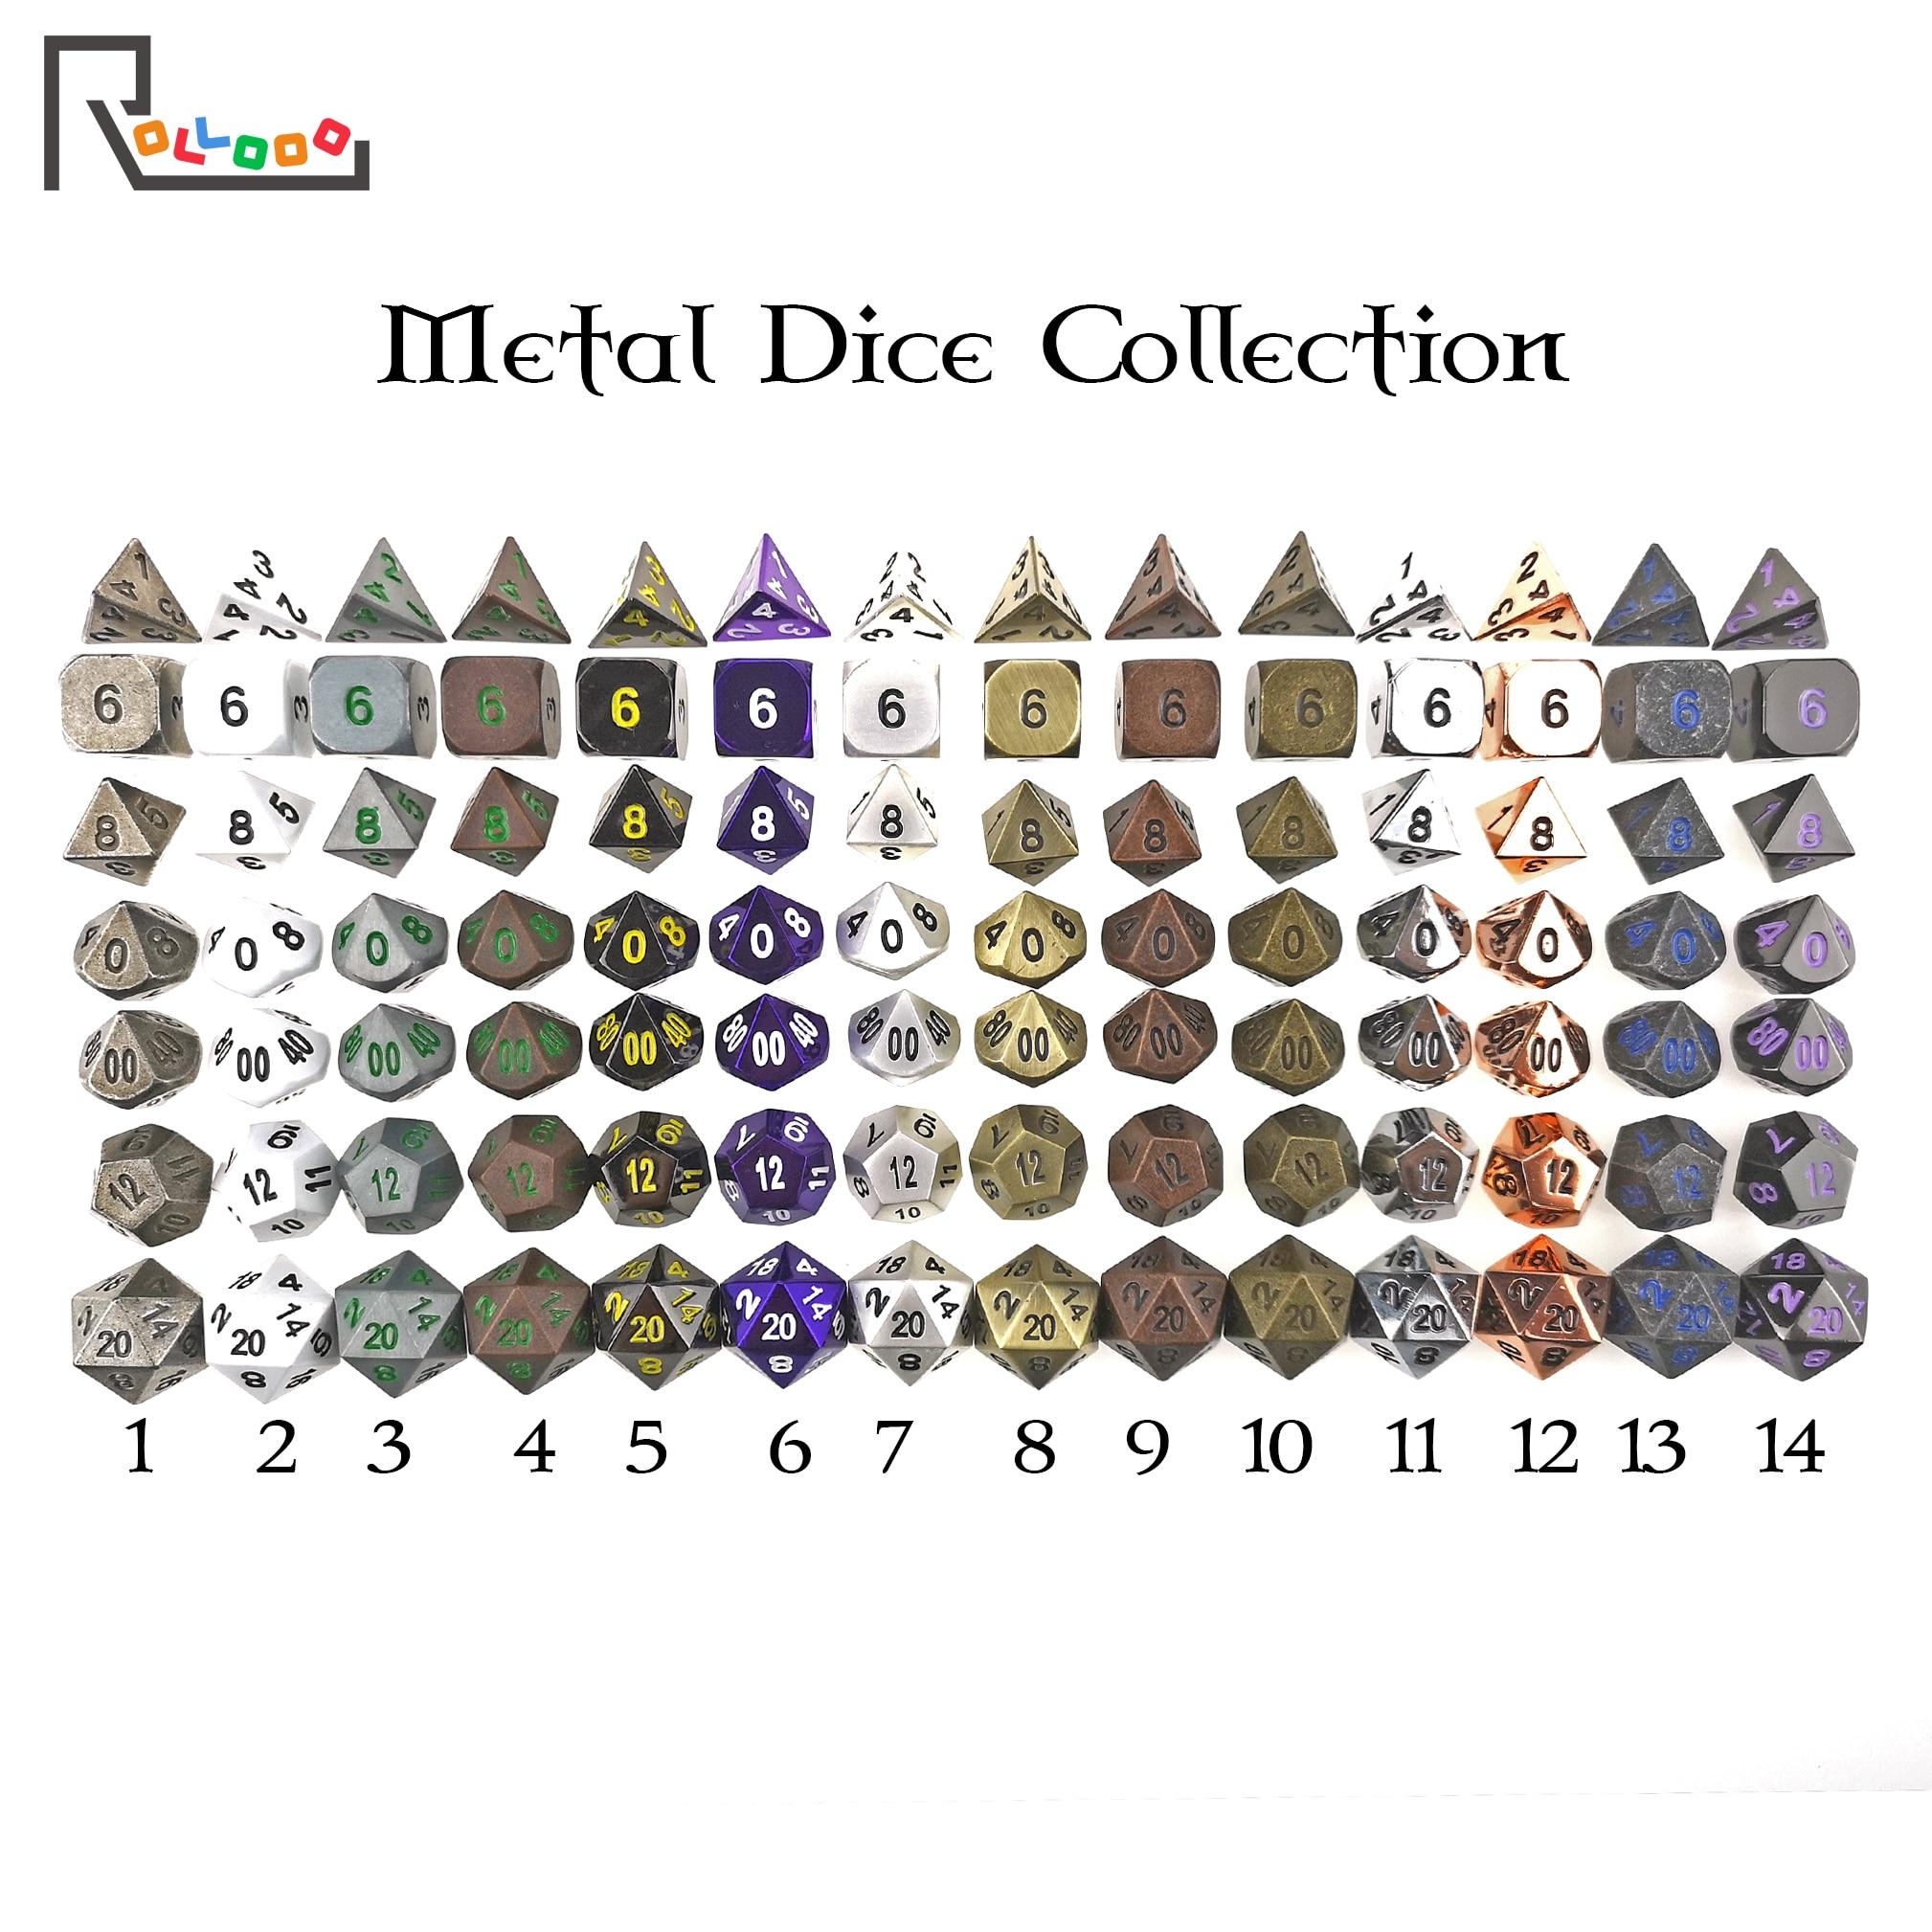 Rollooo 23 cores dnd metal dice coleção d & d conjuntos para rpg roleplaying jogos d4 d6 d8 d10 d % d12 d20